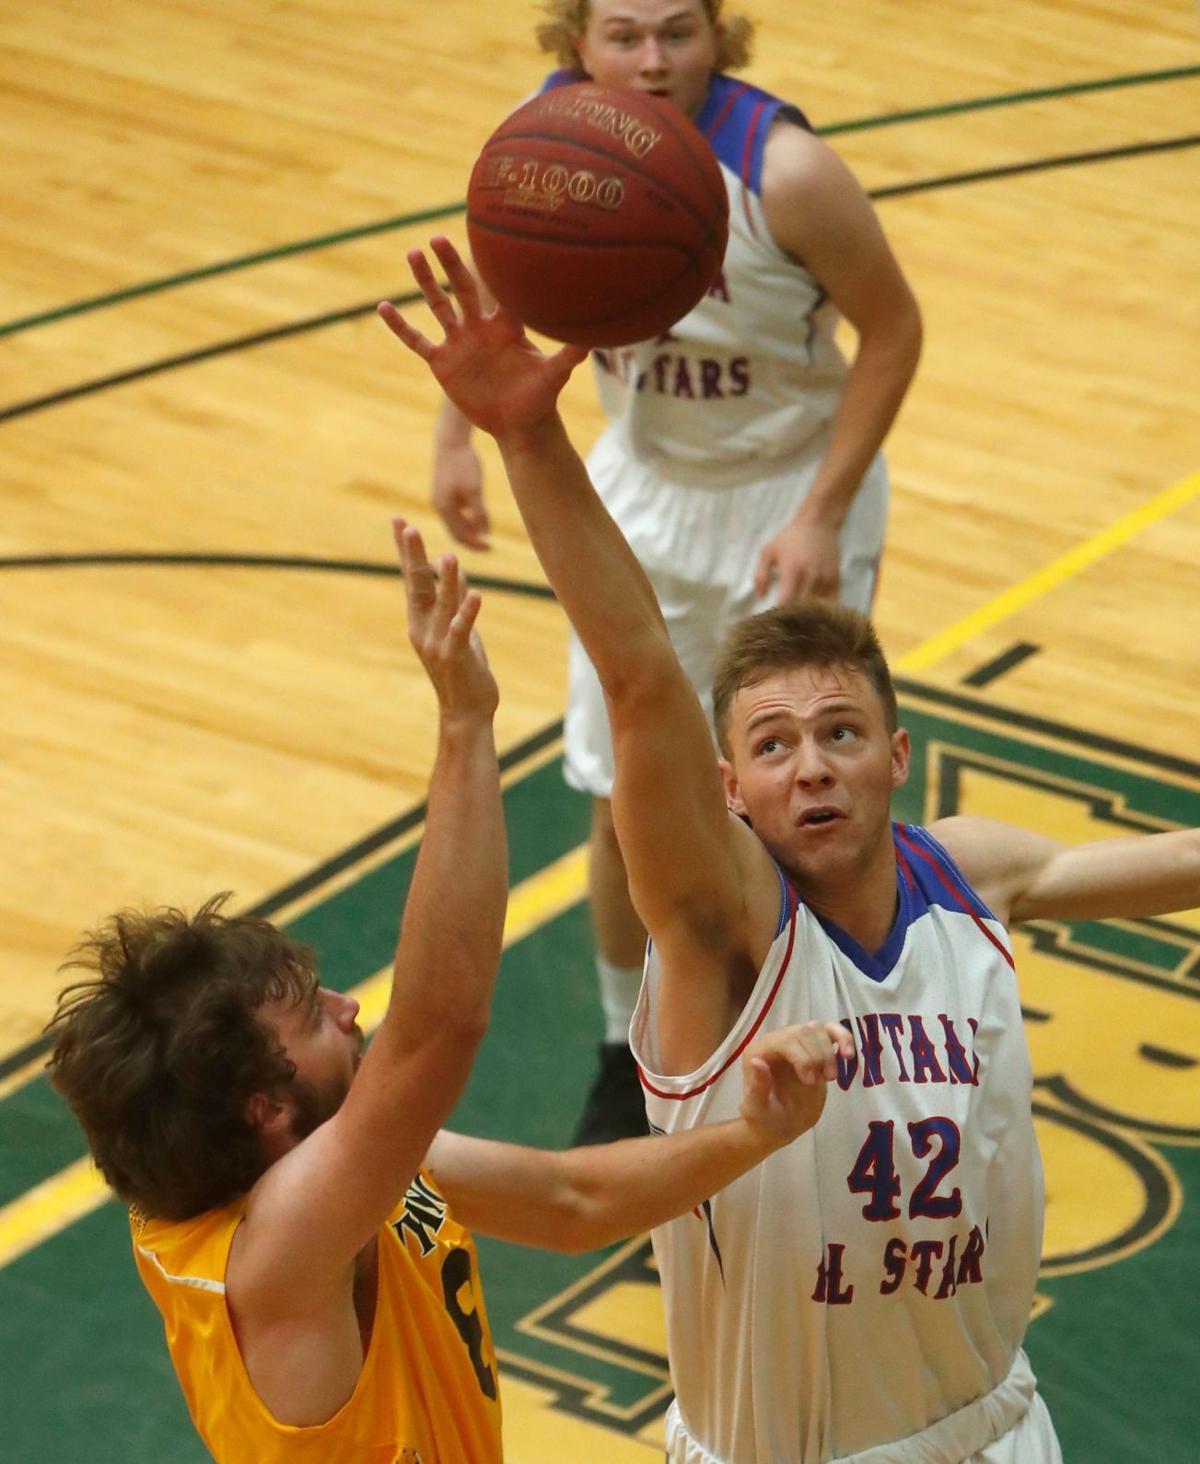 Boys All Star Games, Montana vs Wyoming